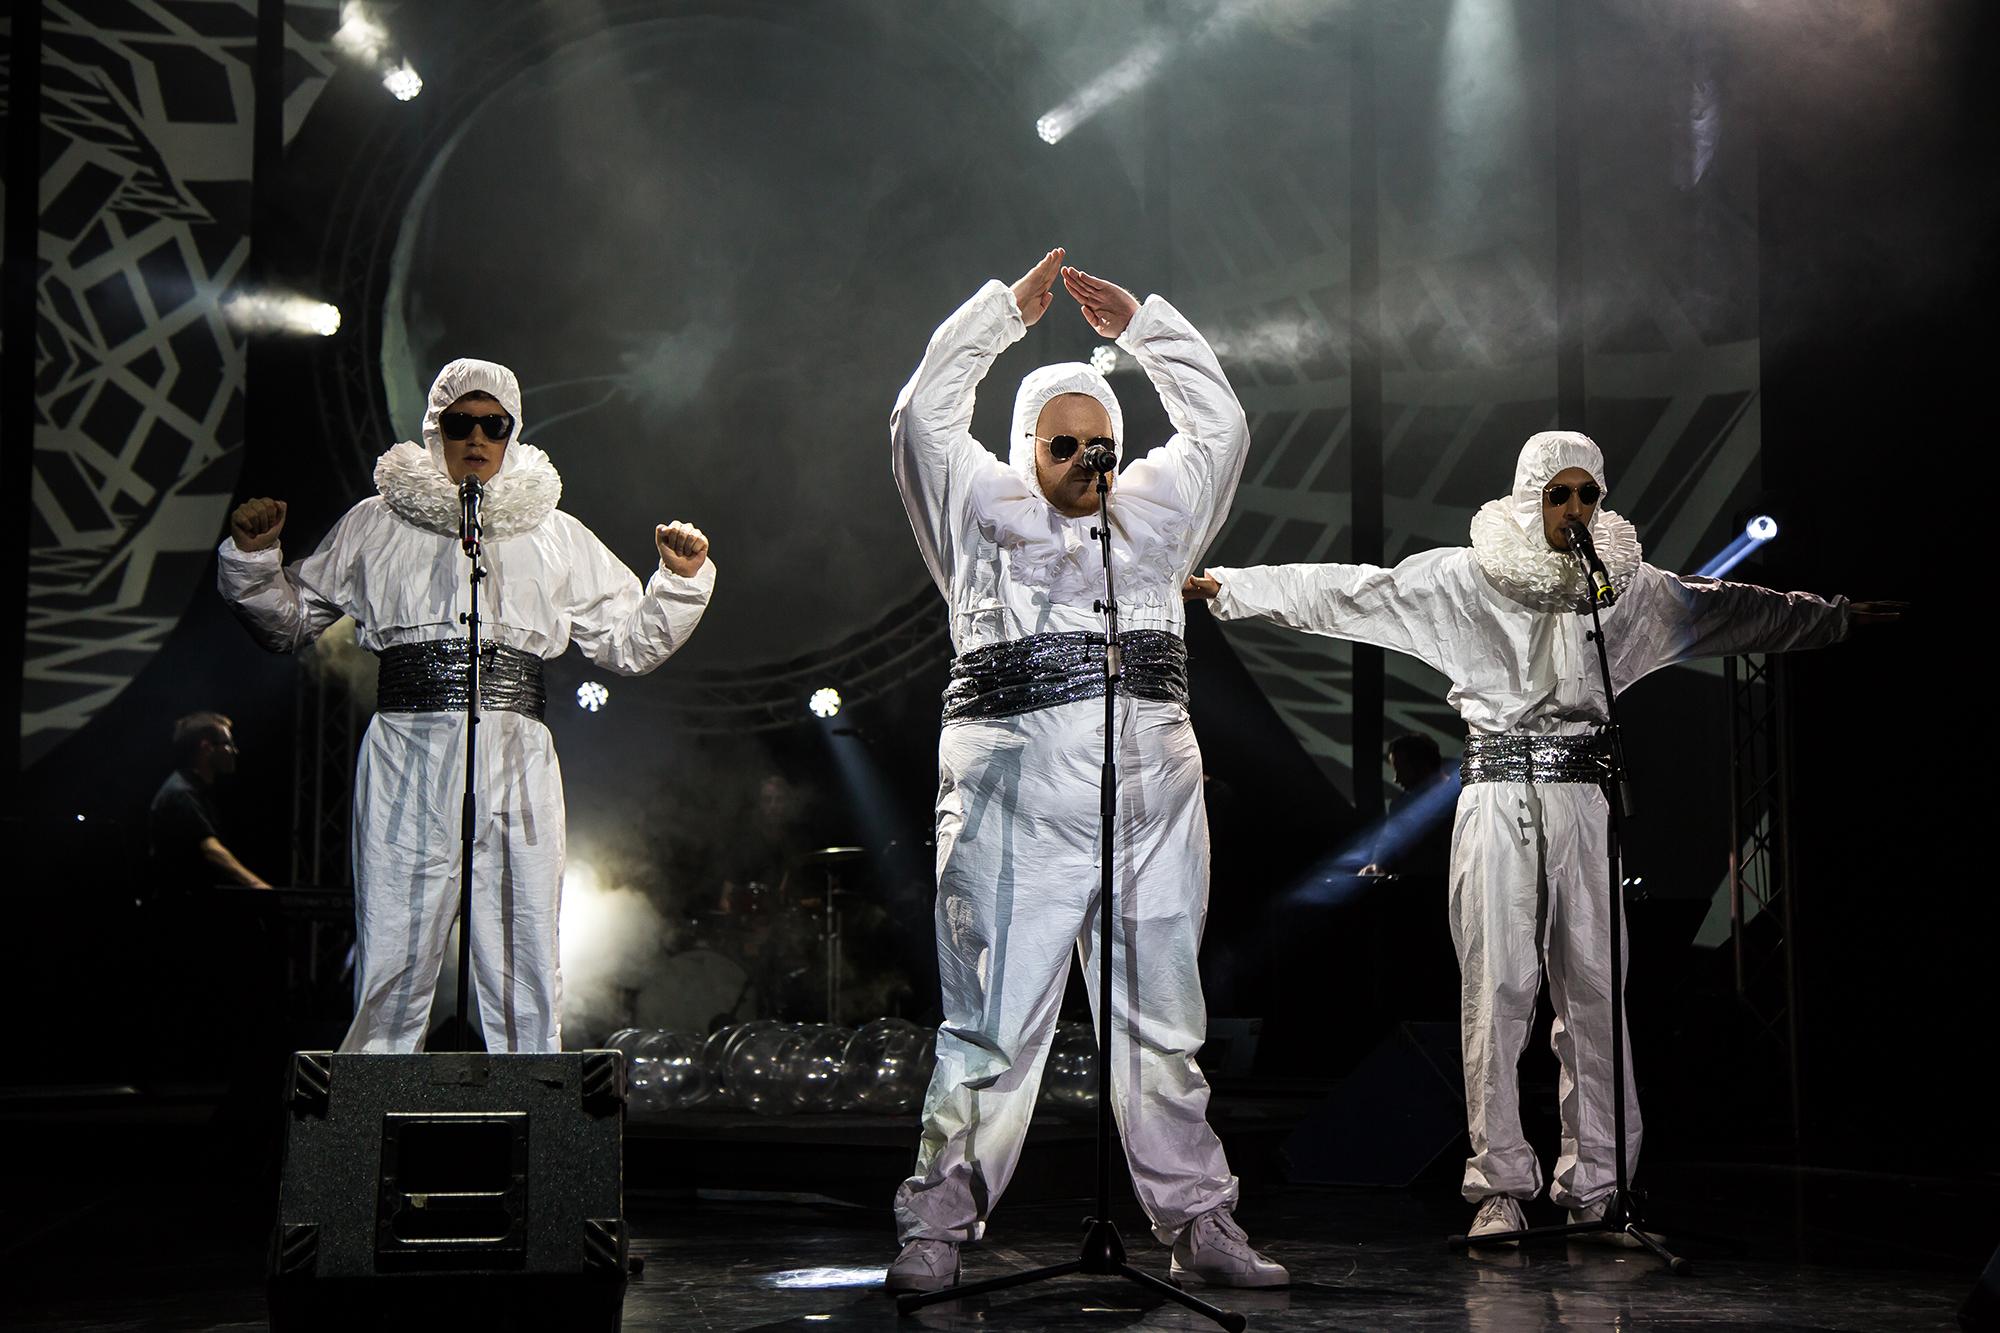 Improvizija 2018- Inštitut Stefan Kraftwerk (Tim Kern - Juš Mil?inski - Voranc Boh) - foto de Maruša Rems. Font: Web Cankarjev Dom